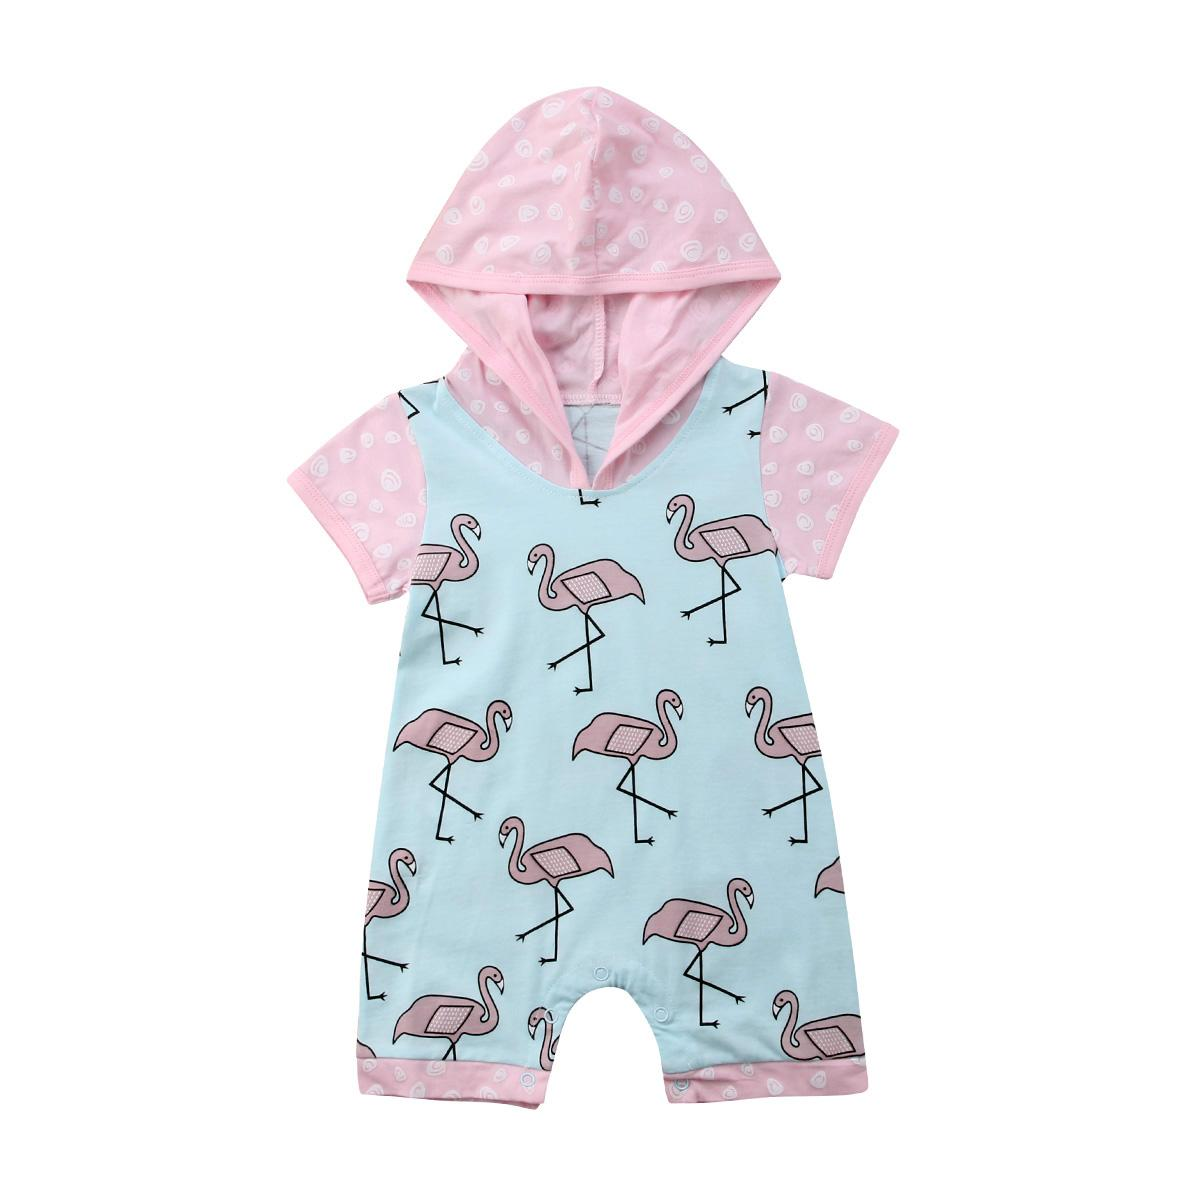 Mädchen-Spielanzug-weiche Baumwollsäuglingsbaby-Short Sleeve Light Blue Body Outfit Netter mit Kapuze Overall Pyjamas 0-18M